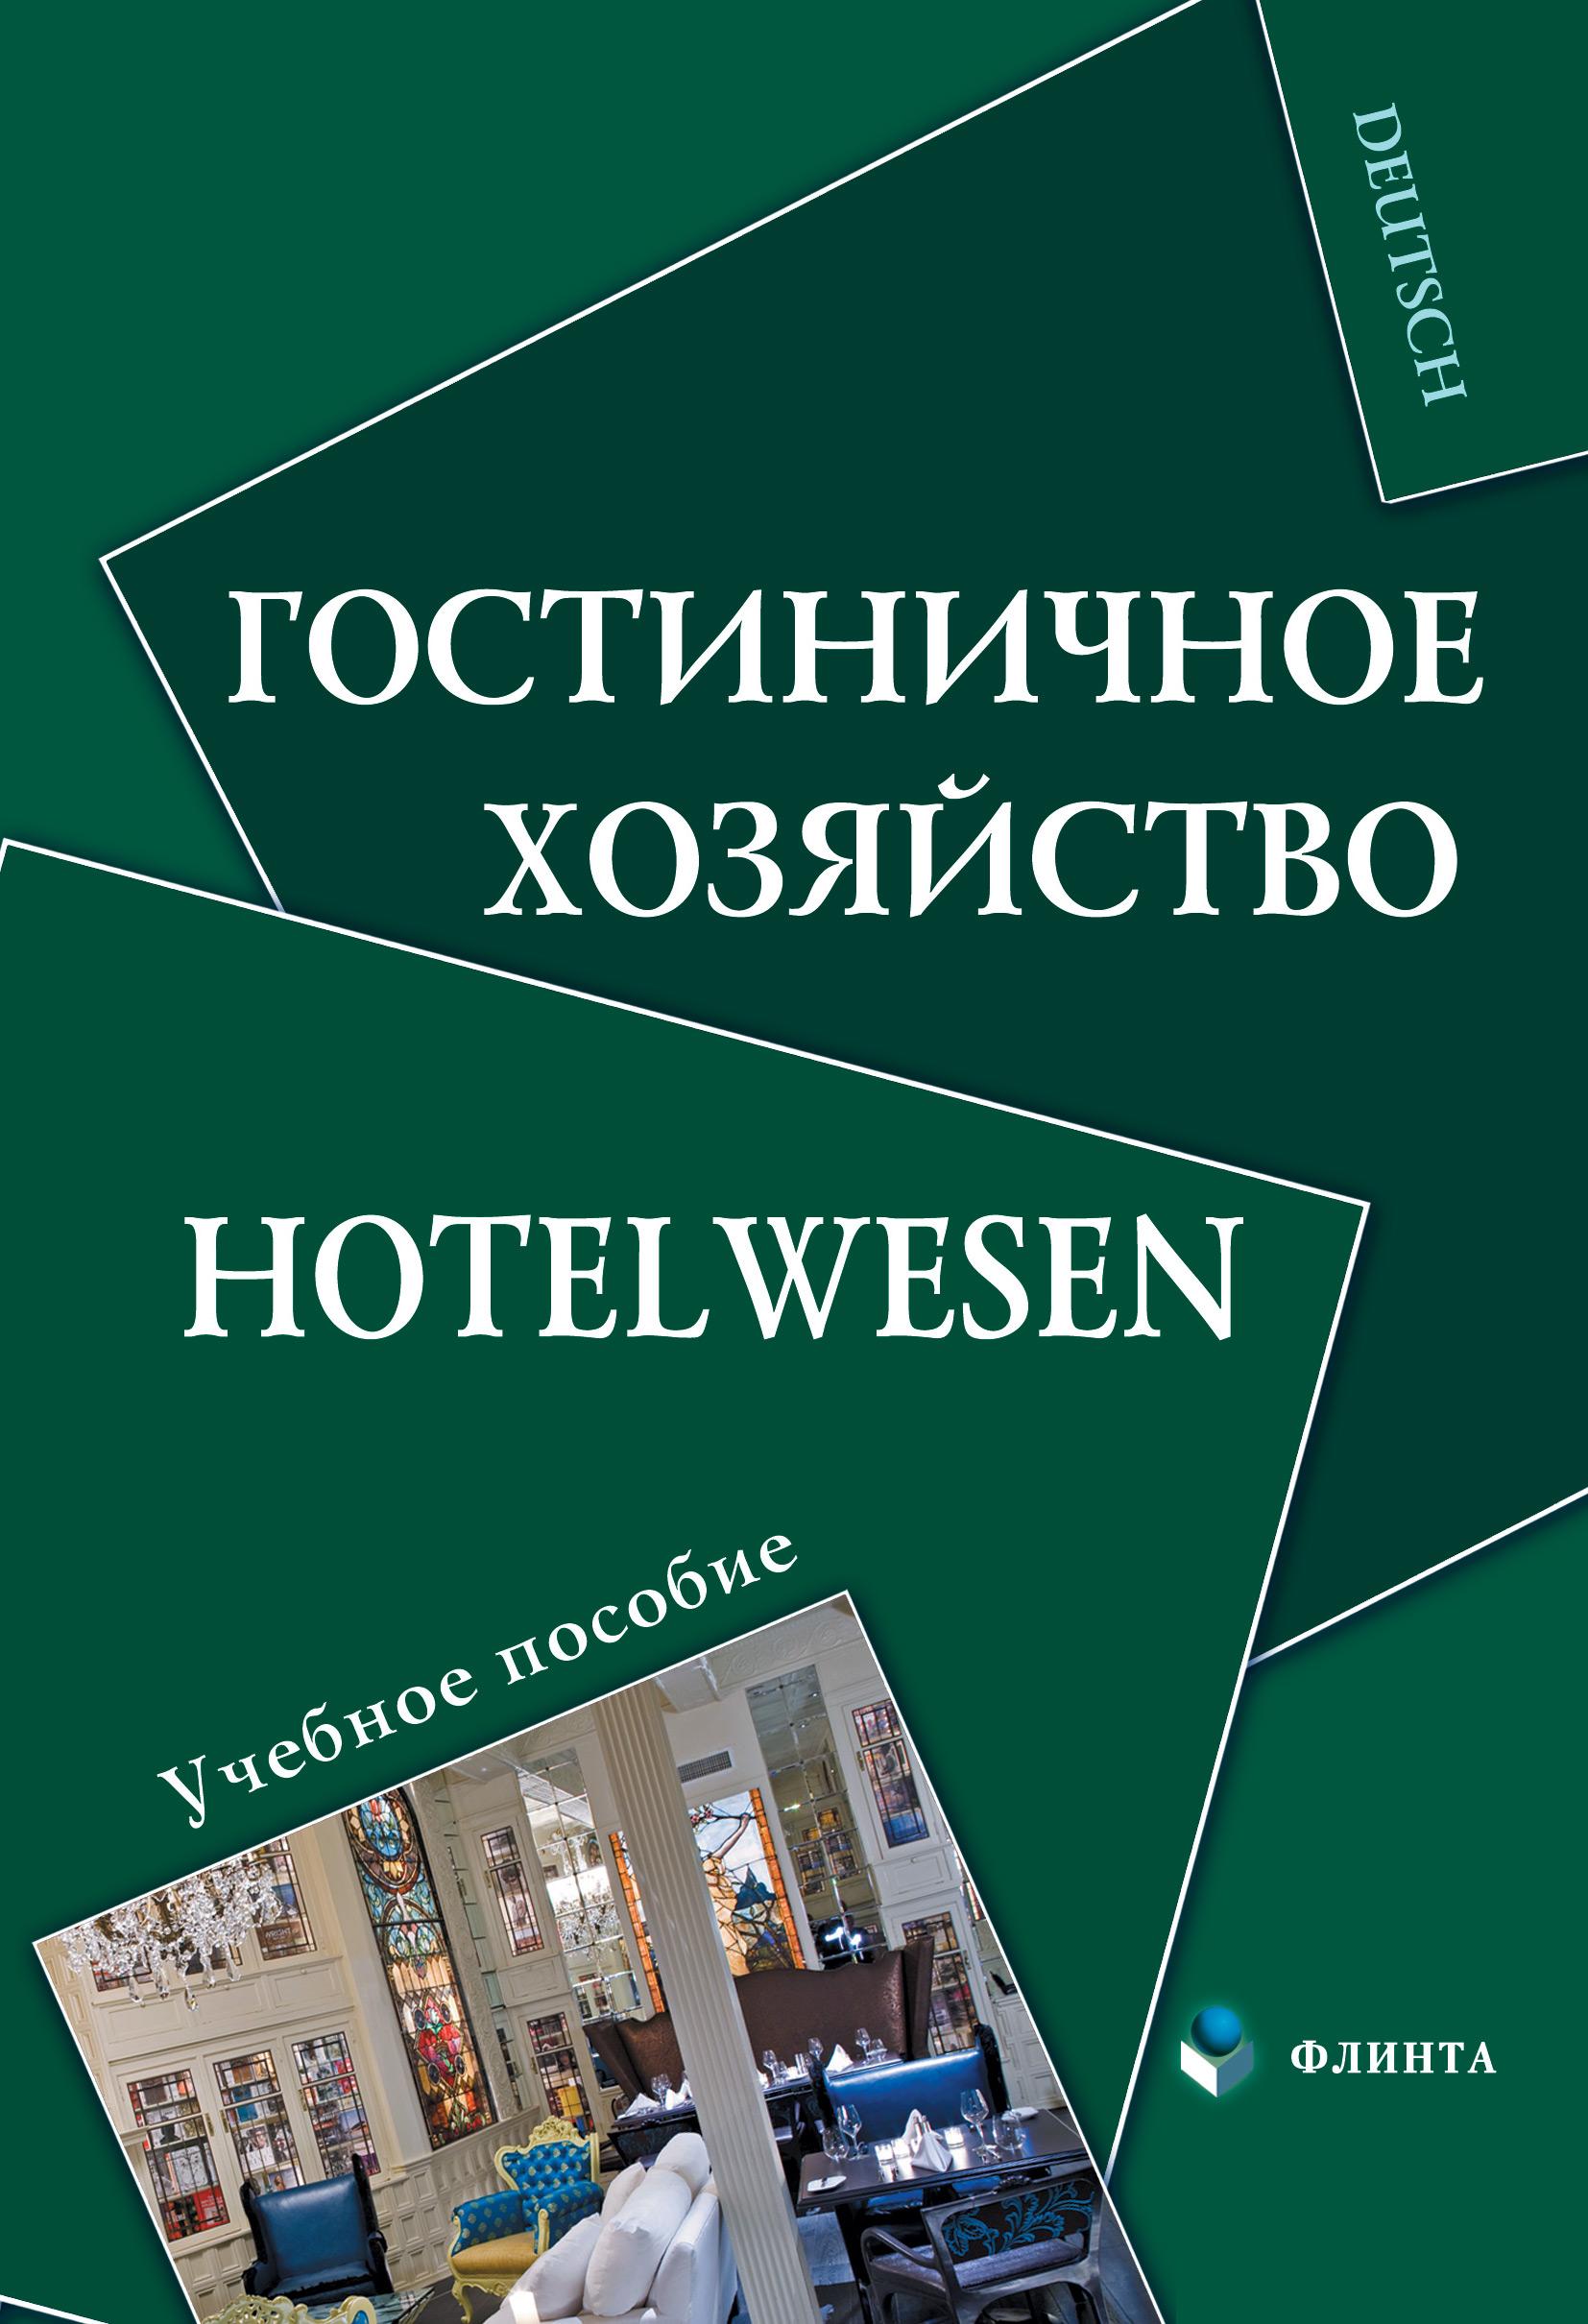 Гостиничное хозяйство. Hotelwesen